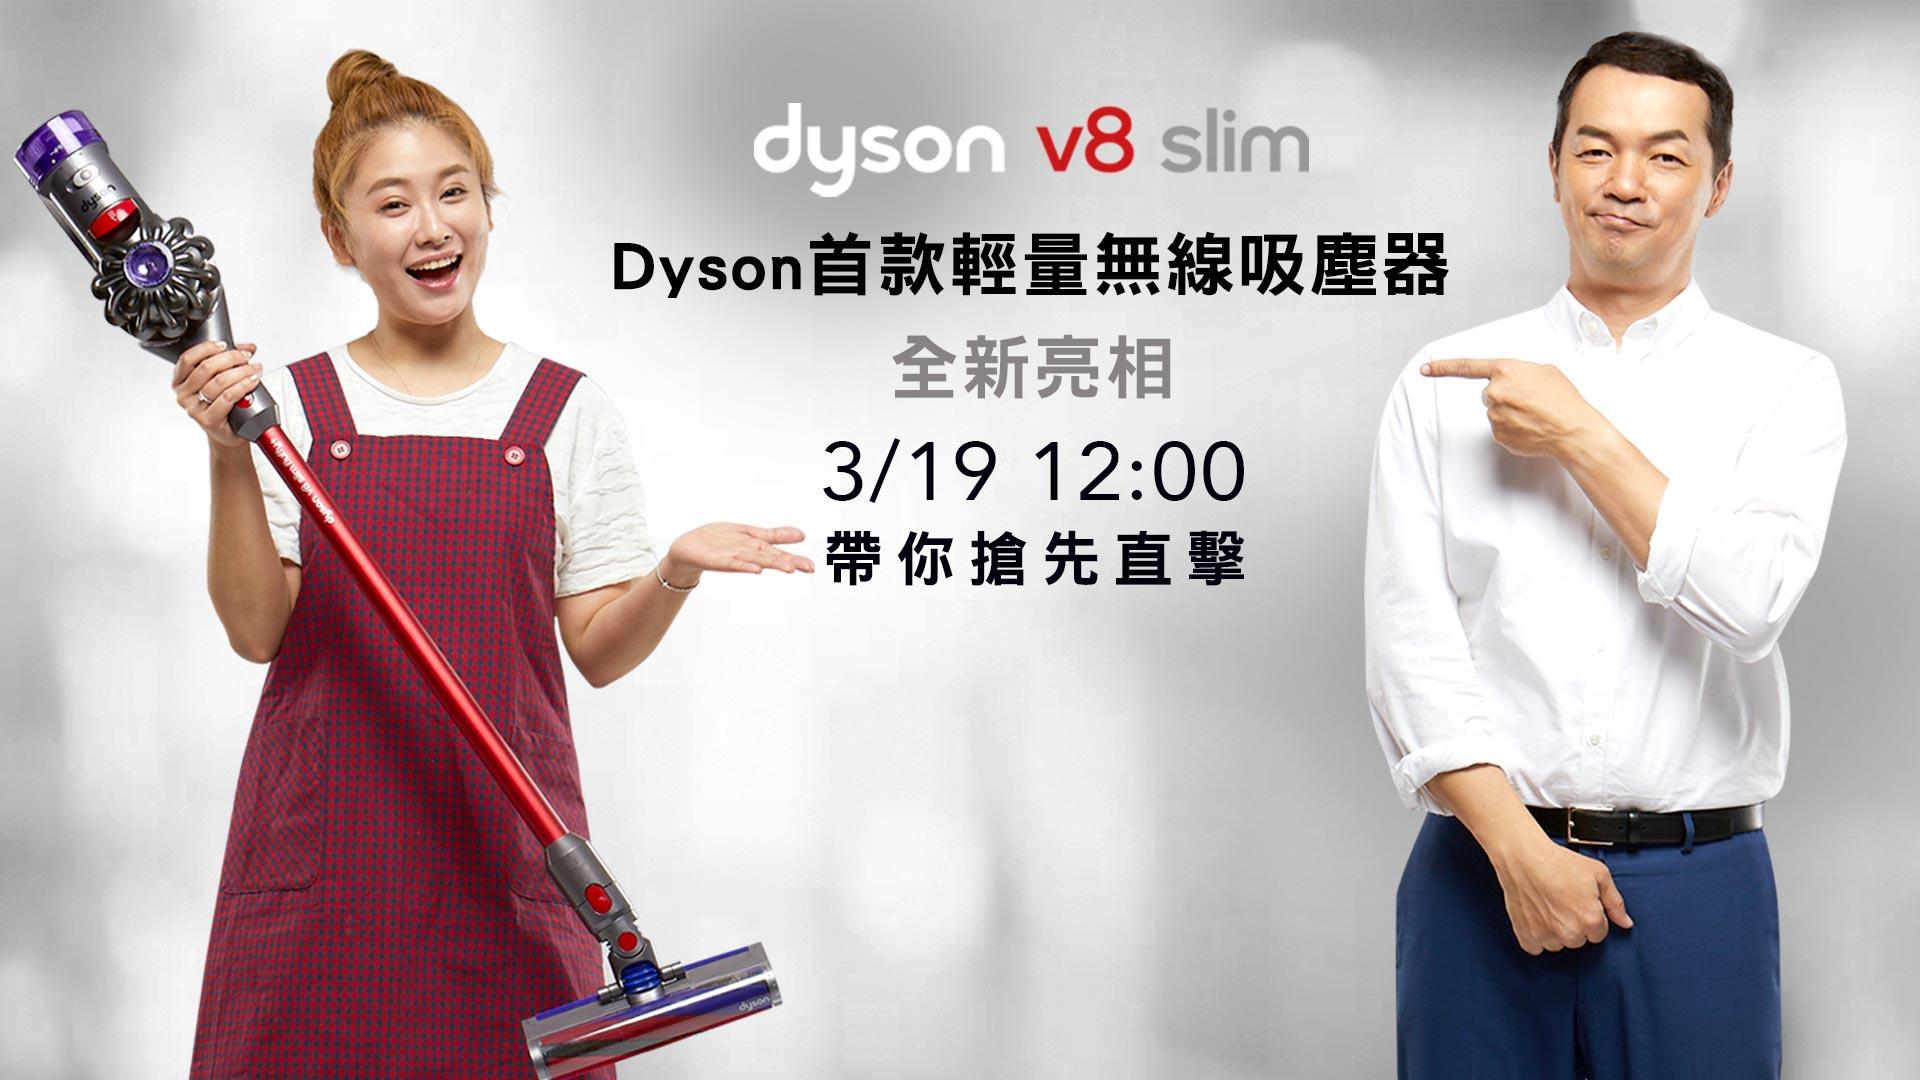 YahooTV 輕量靈巧!Dyson V8 Slim 無線吸塵器 全新亮相